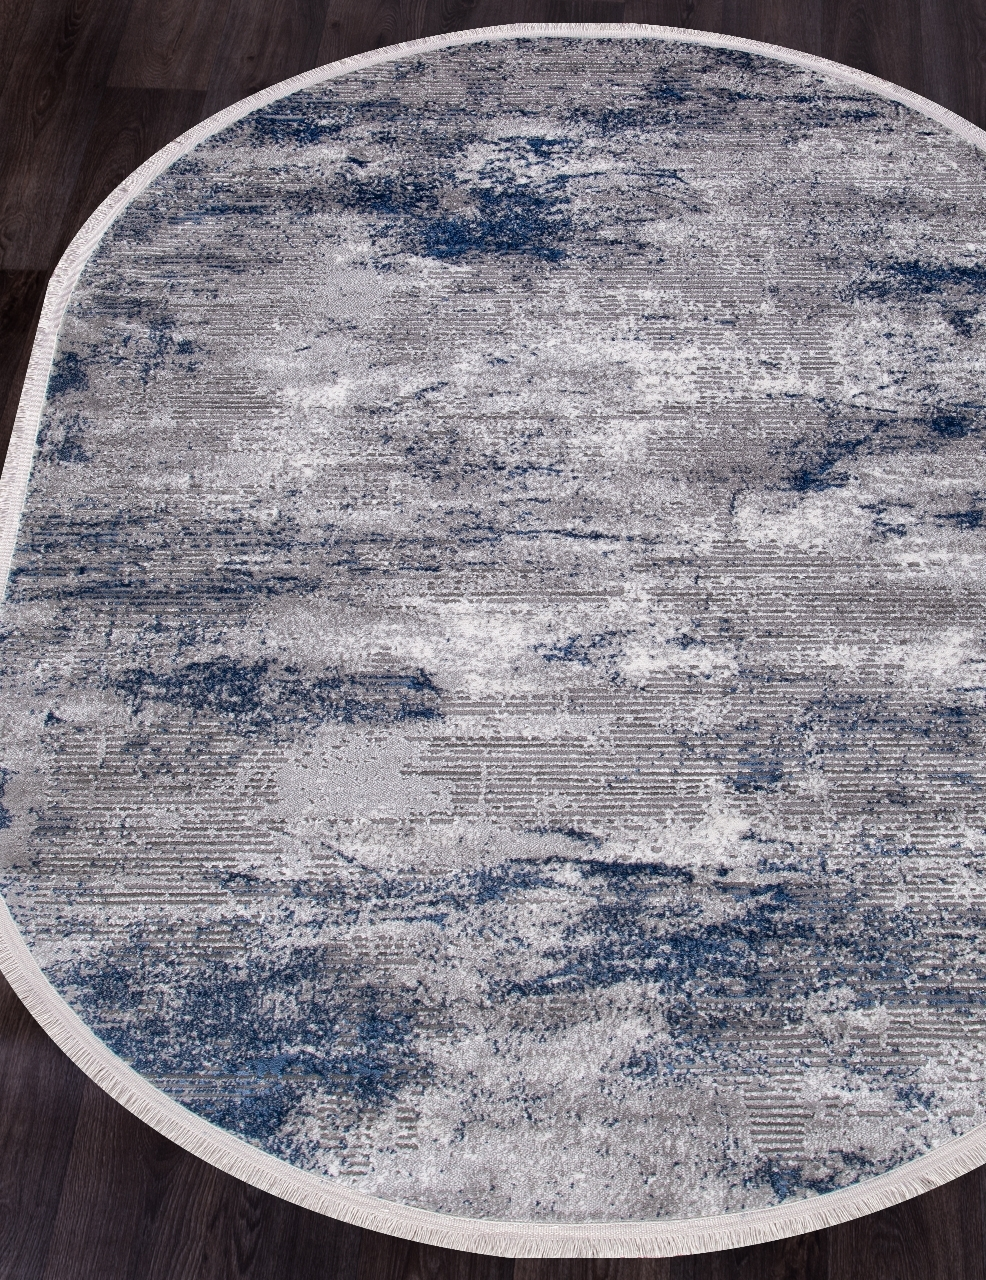 Ковер AS 838 - NAVY / GREY - Овал - коллекция MOROCCO